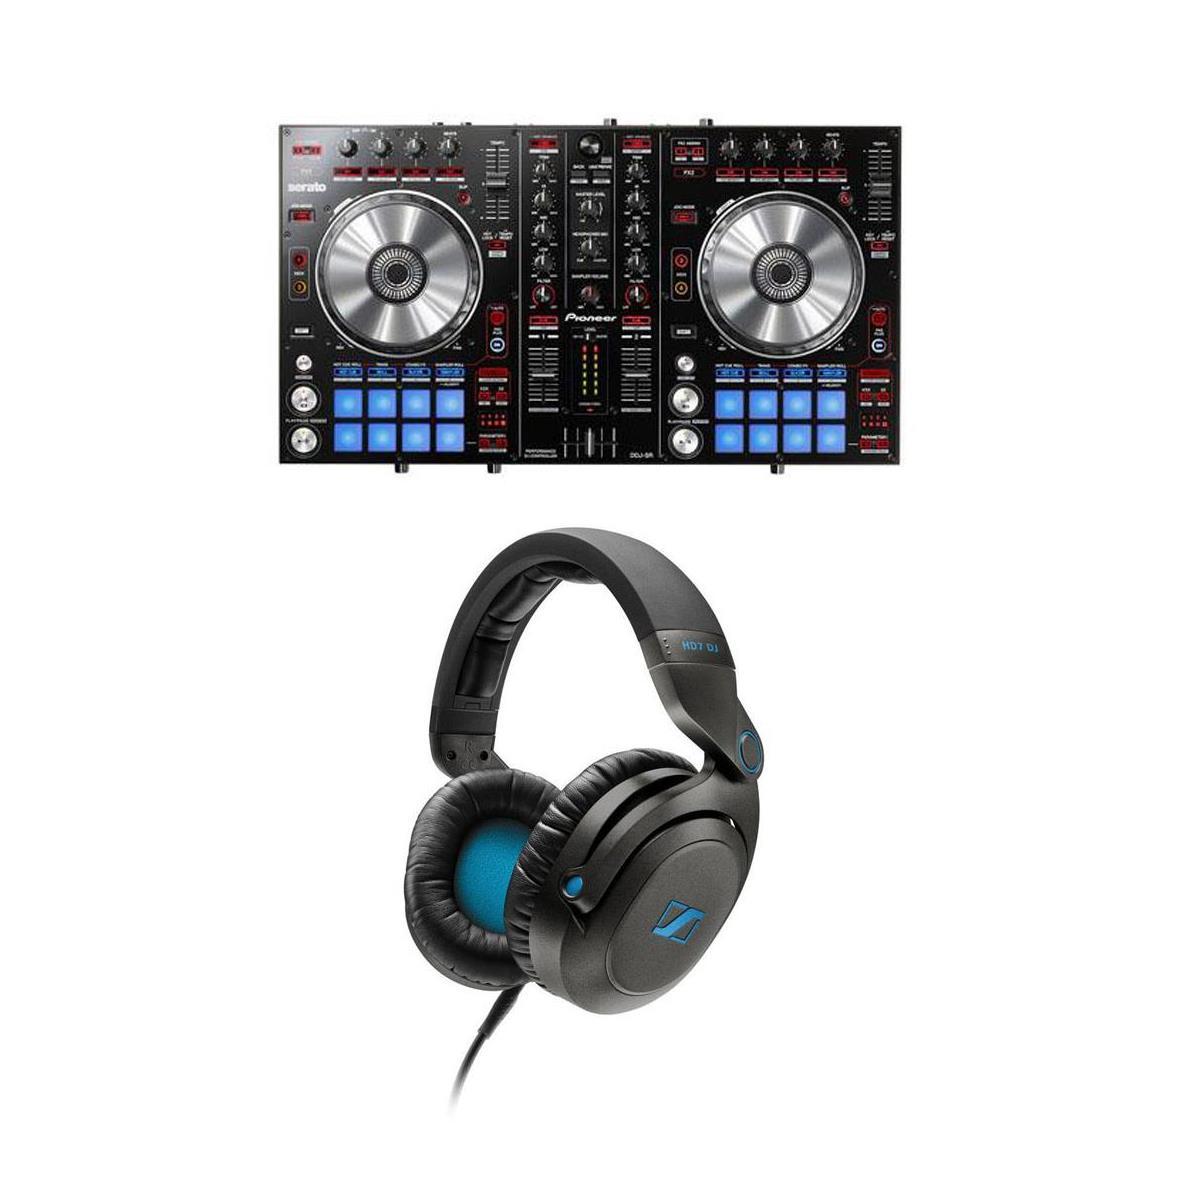 Pioneer DDJ-SR 2-Ch Serato DJ Controller + Sennheiser HD7 DJ Headphones $599 or Pioneer DDJ-SX2 4-Ch Serato DJ Controller + Sennheiser HD8 DJ Headphones $999 + Free shipping